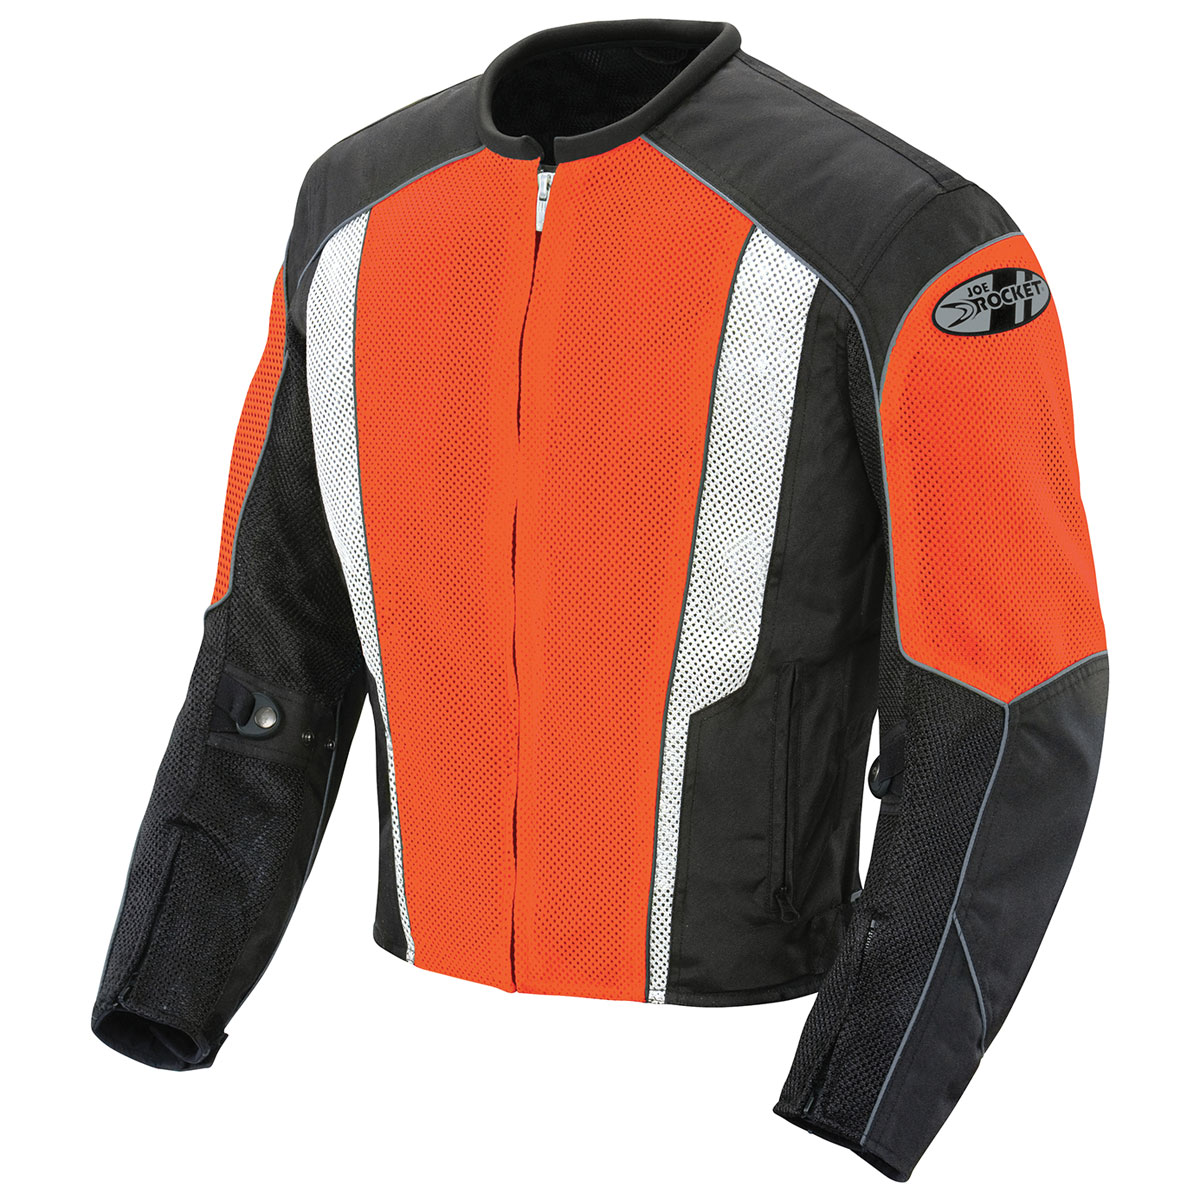 Joe Rocket Men's Phoenix 5.0 Orange/Black Mesh Jacket